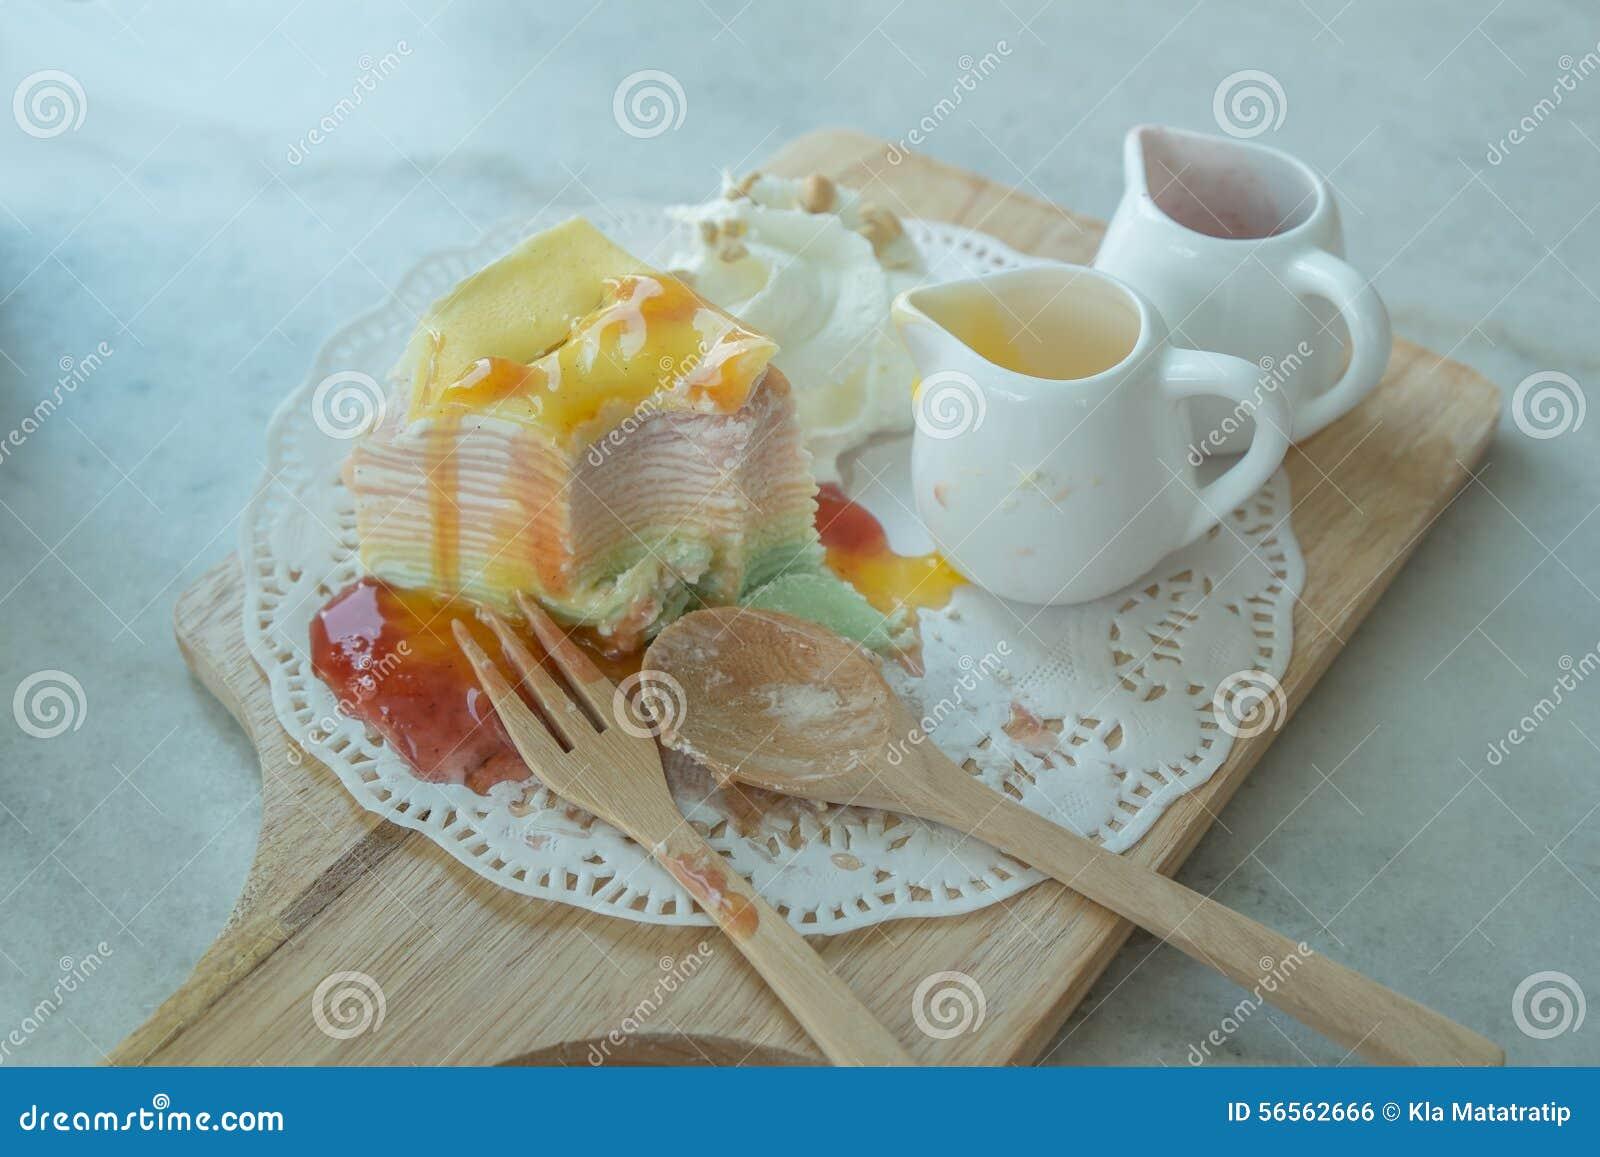 Download Το ουράνιο τόξο Crepe το κέικ στο Mable πίνακα Στοκ Εικόνες - εικόνα από πορτοκάλι, καρπός: 56562666